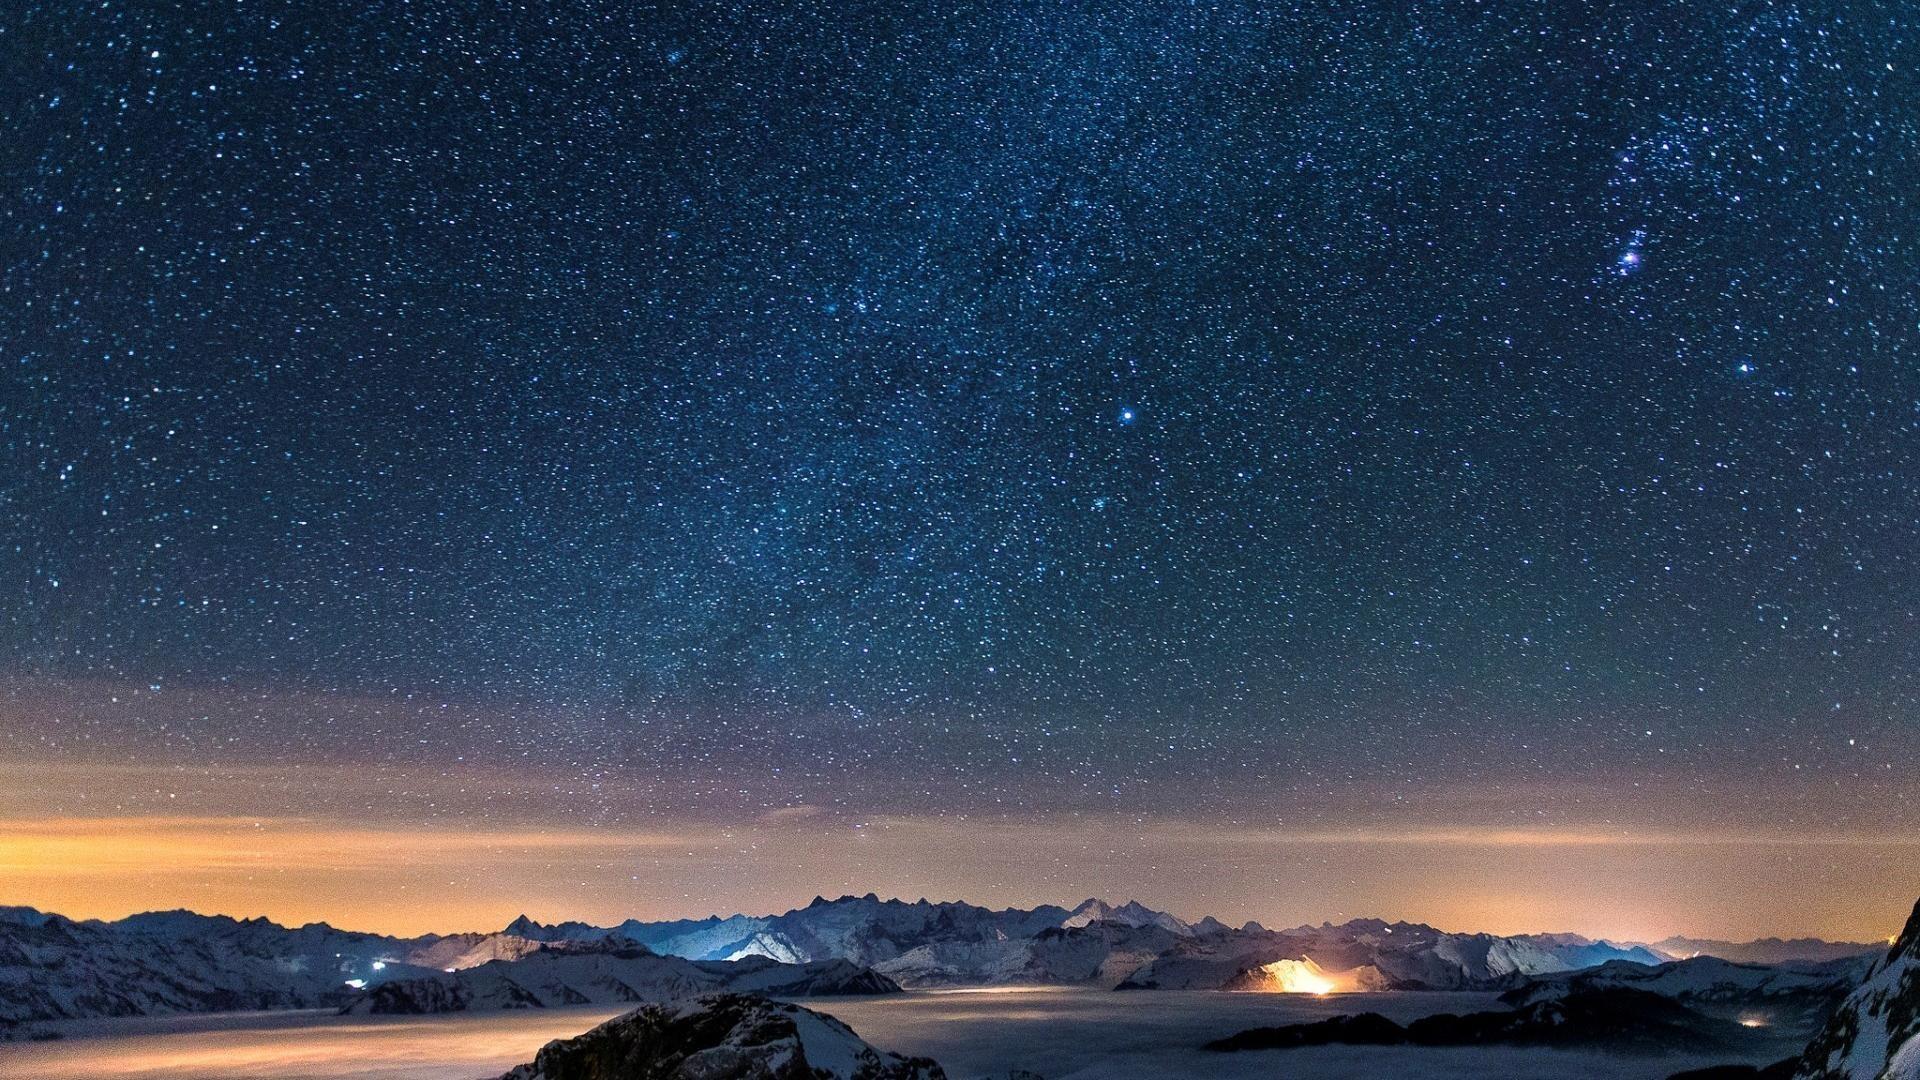 Snow stars wall night sky wallpaper   (59391)